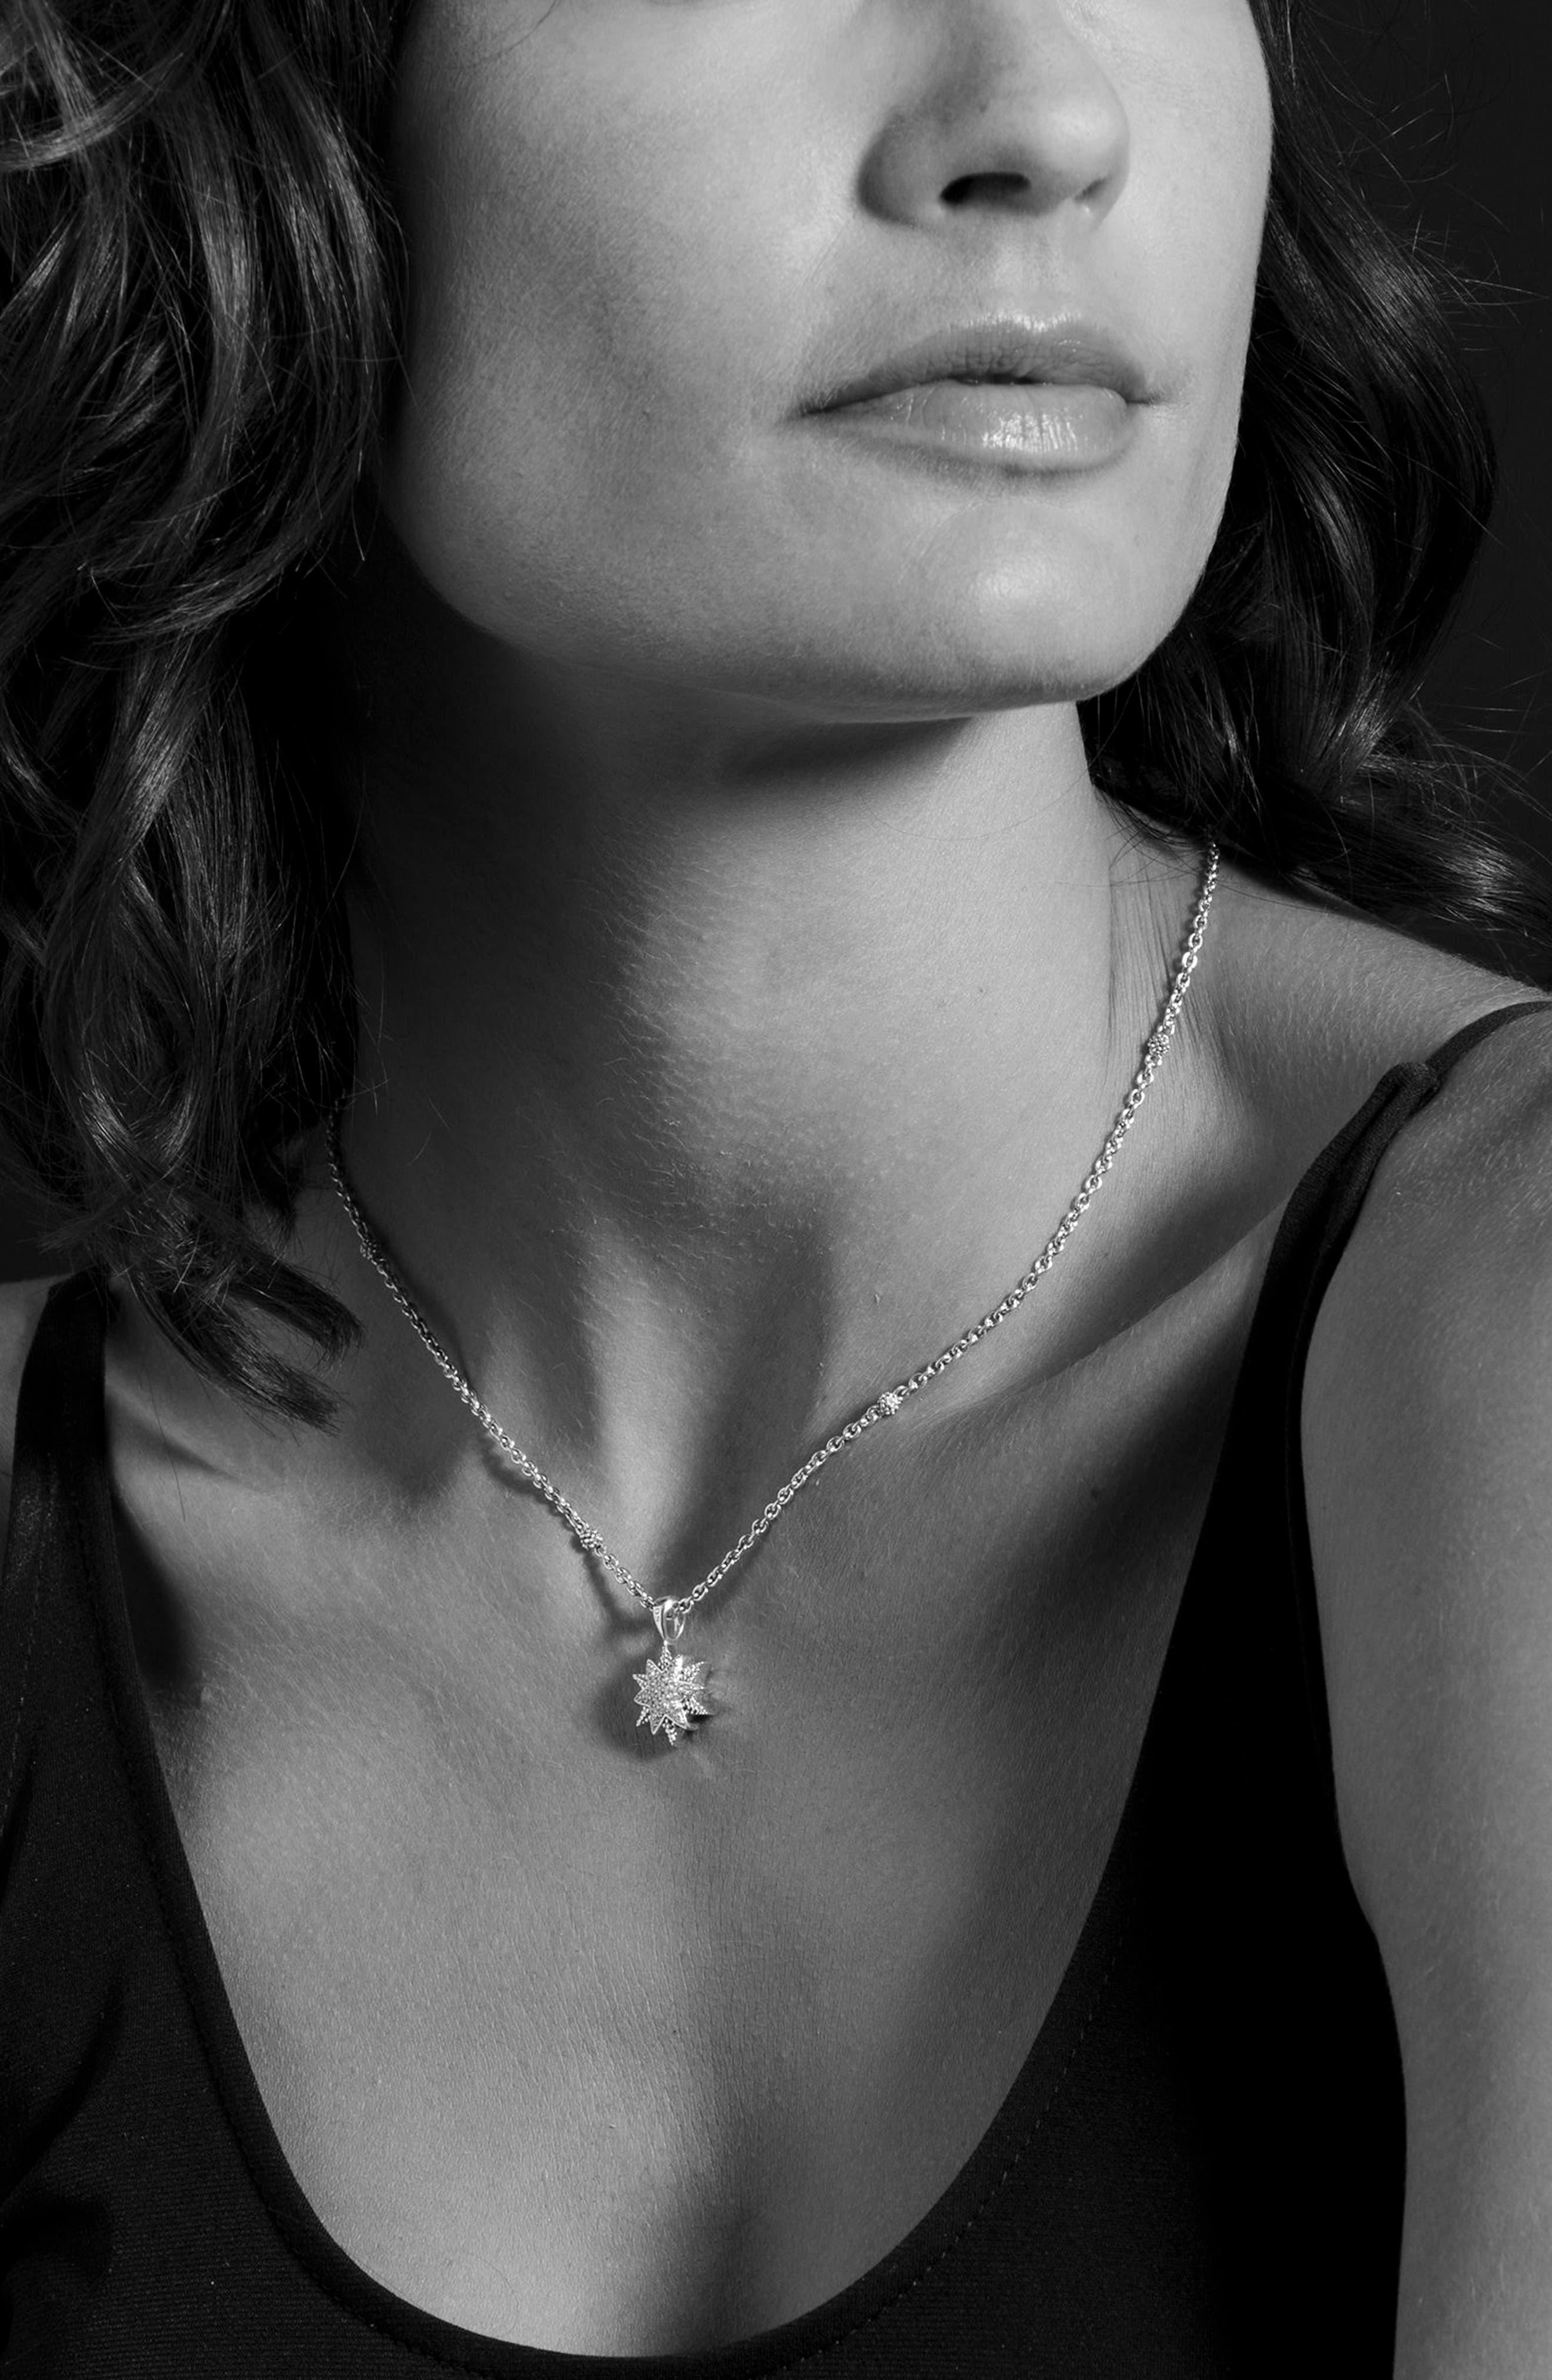 North Star Small Diamond Pendant Necklace,                             Alternate thumbnail 5, color,                             DIAMOND